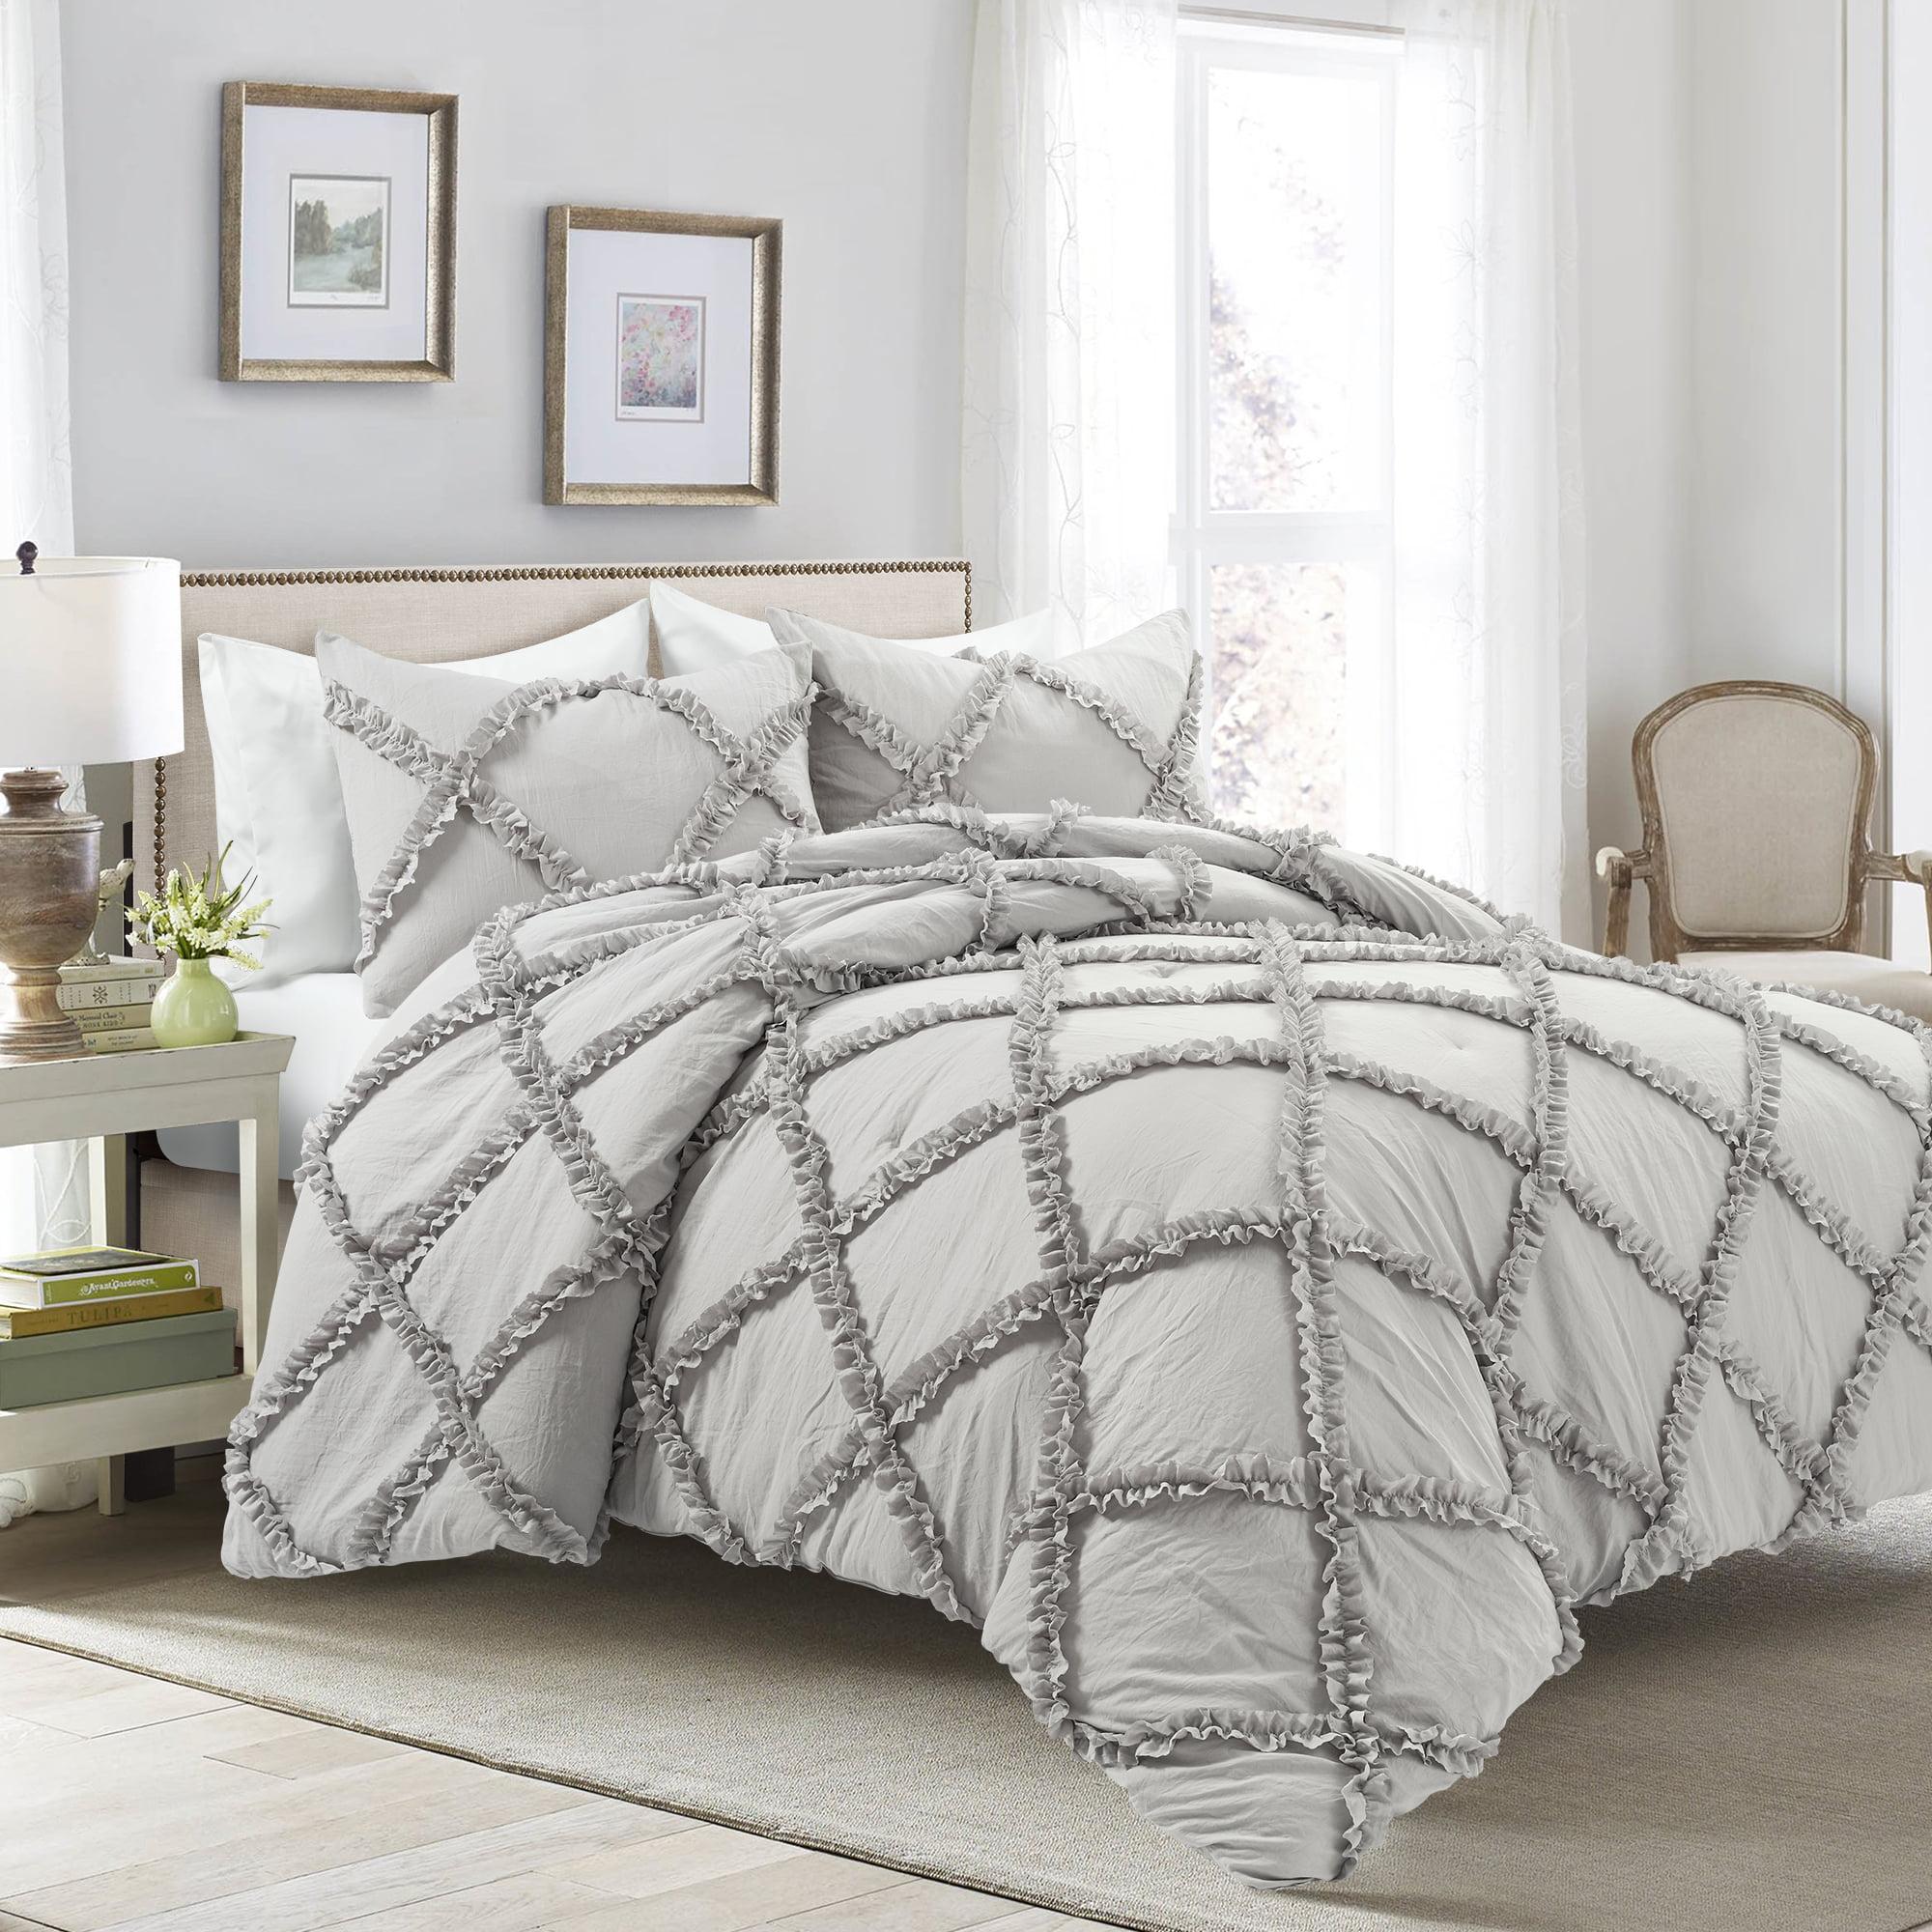 Lush Decor Ruffle Diamond Comforter Set Light Gray 3pc Set Full Queen Walmart Com Walmart Com